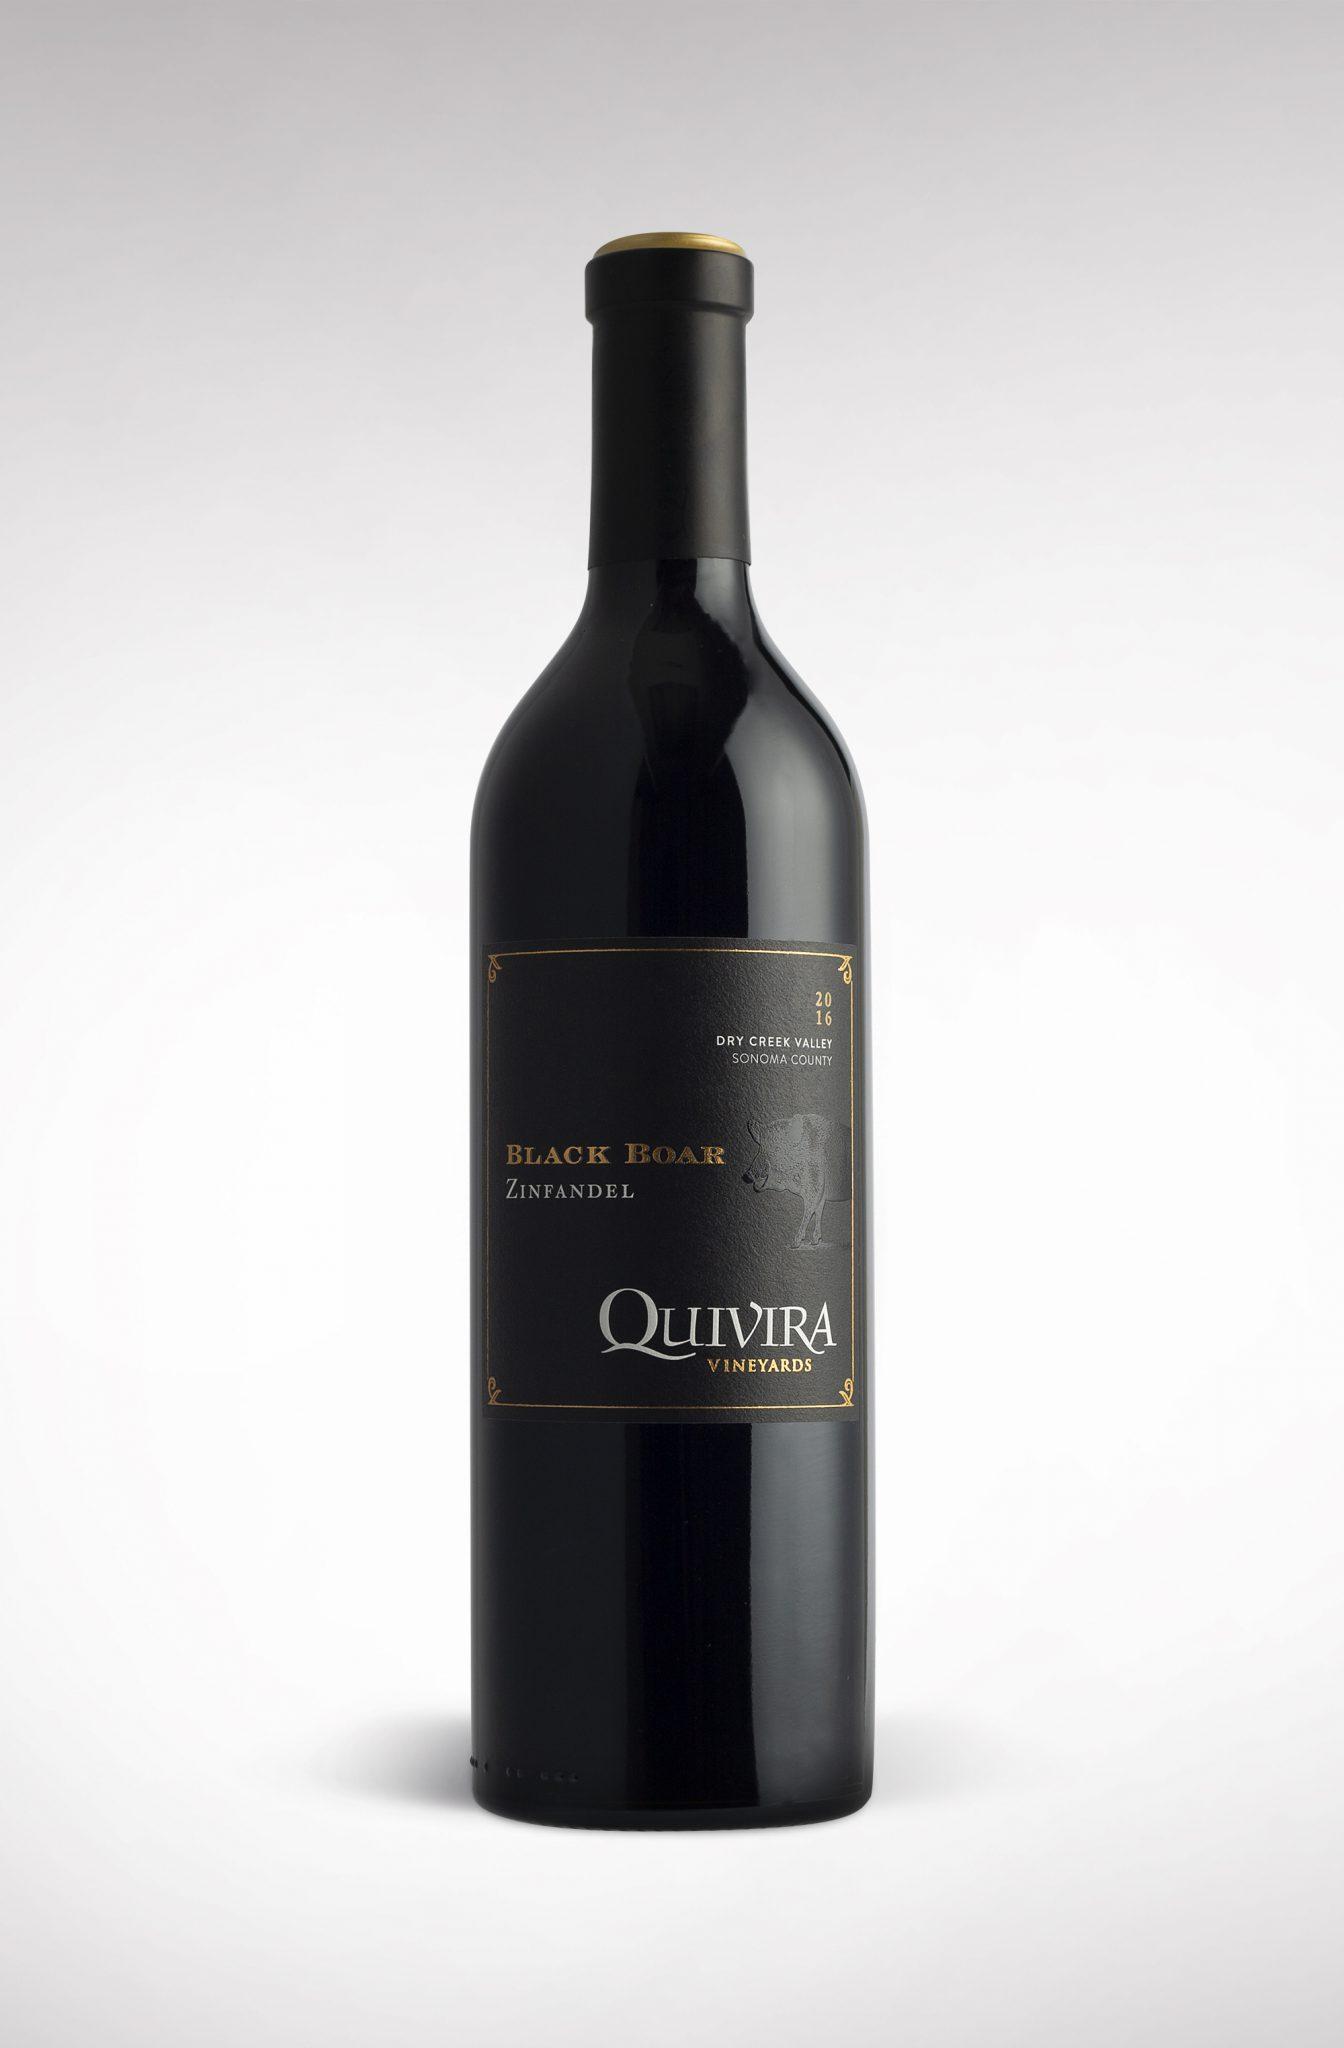 Black Boar by Quivira Wine Label Design